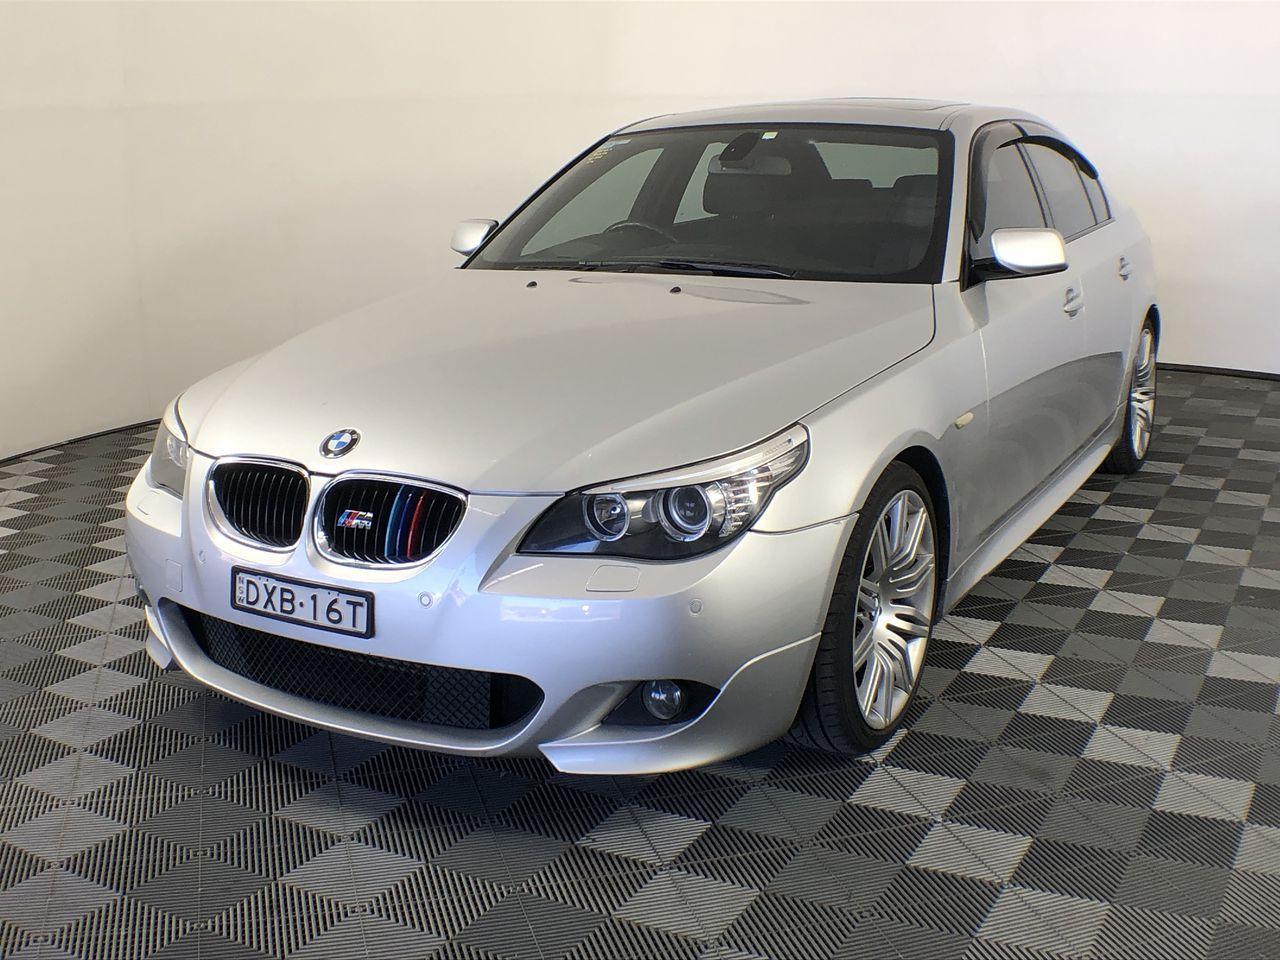 2009 BMW 5 20d E60 M-SPORT Turbo Diesel Auto Sedan